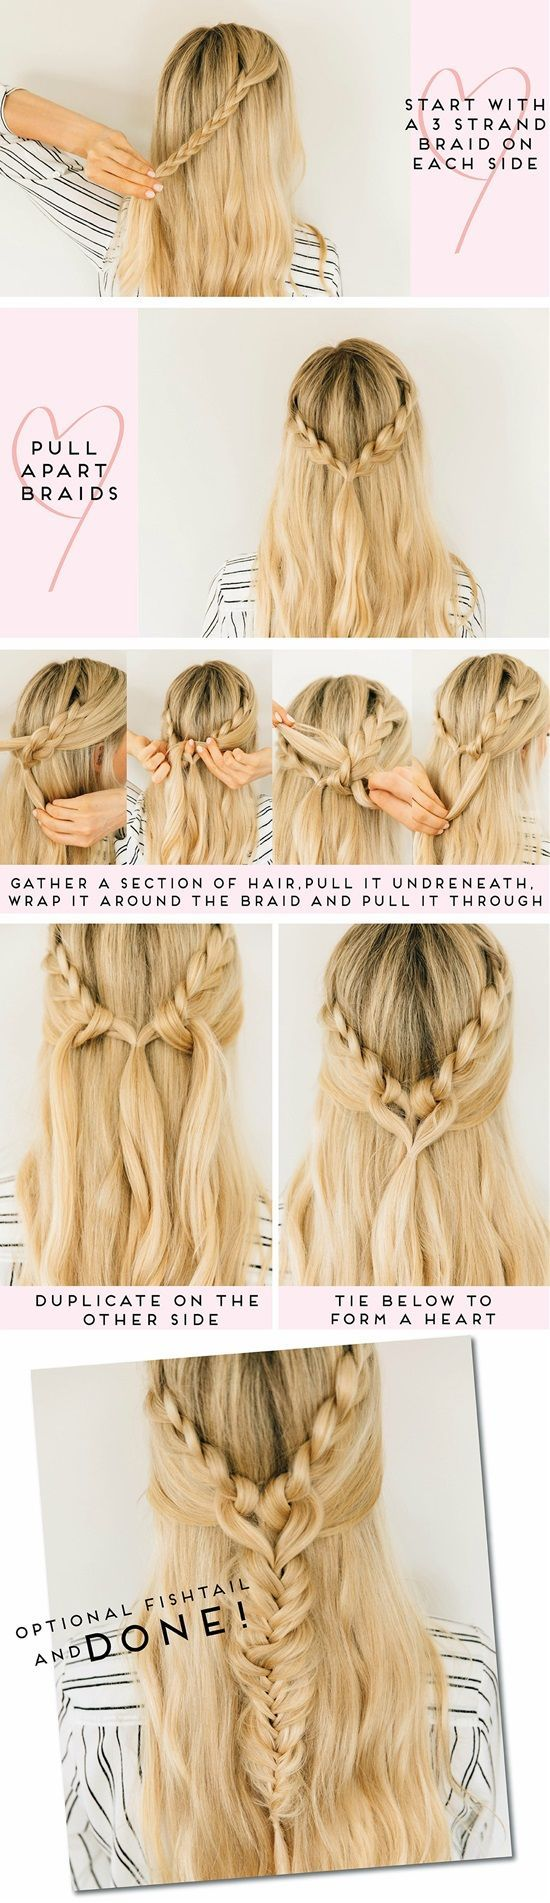 ways to make braids interesting again simple braids hair band